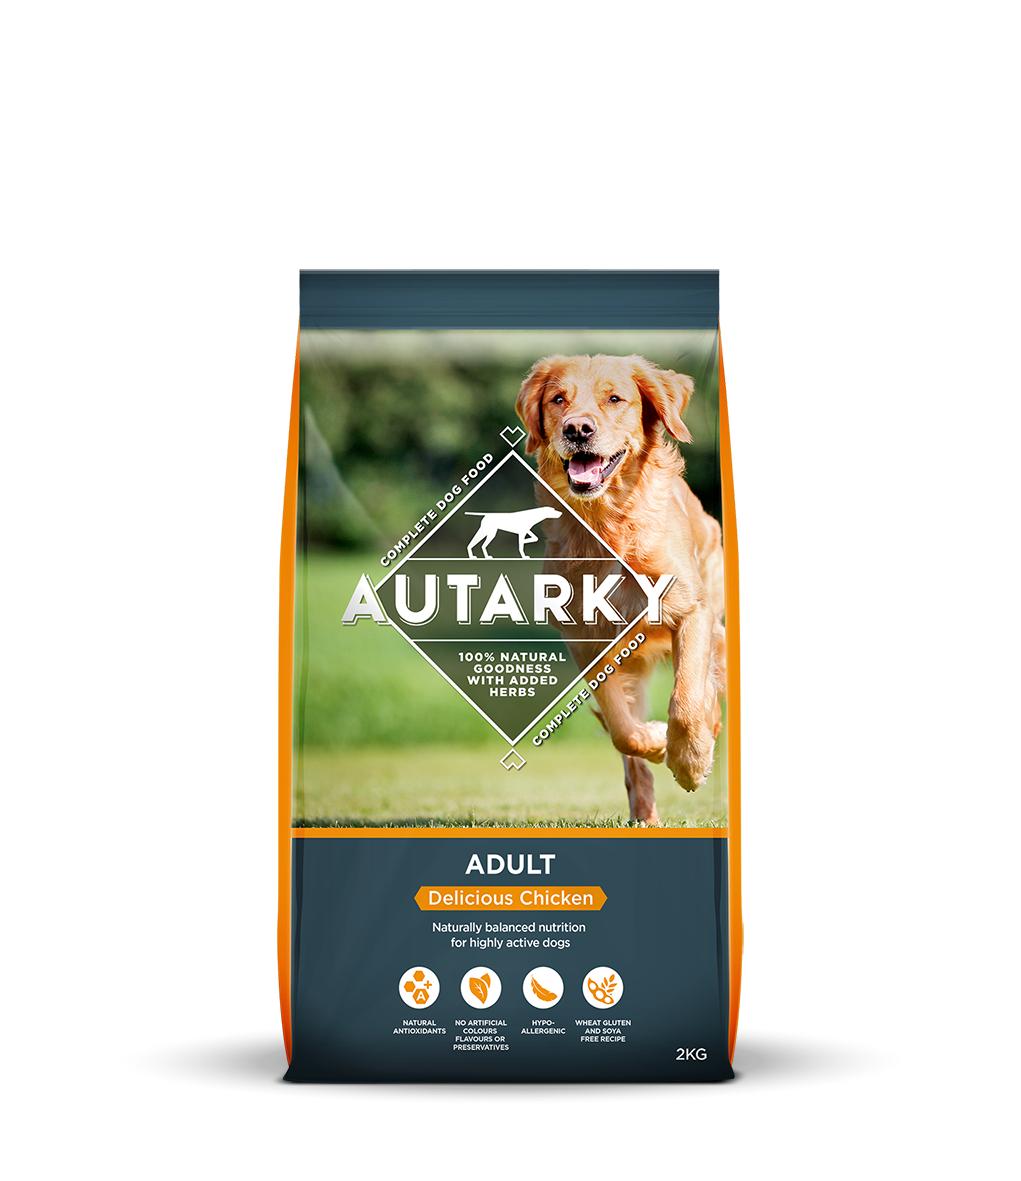 2x muestras gratis comida perro GRATIS